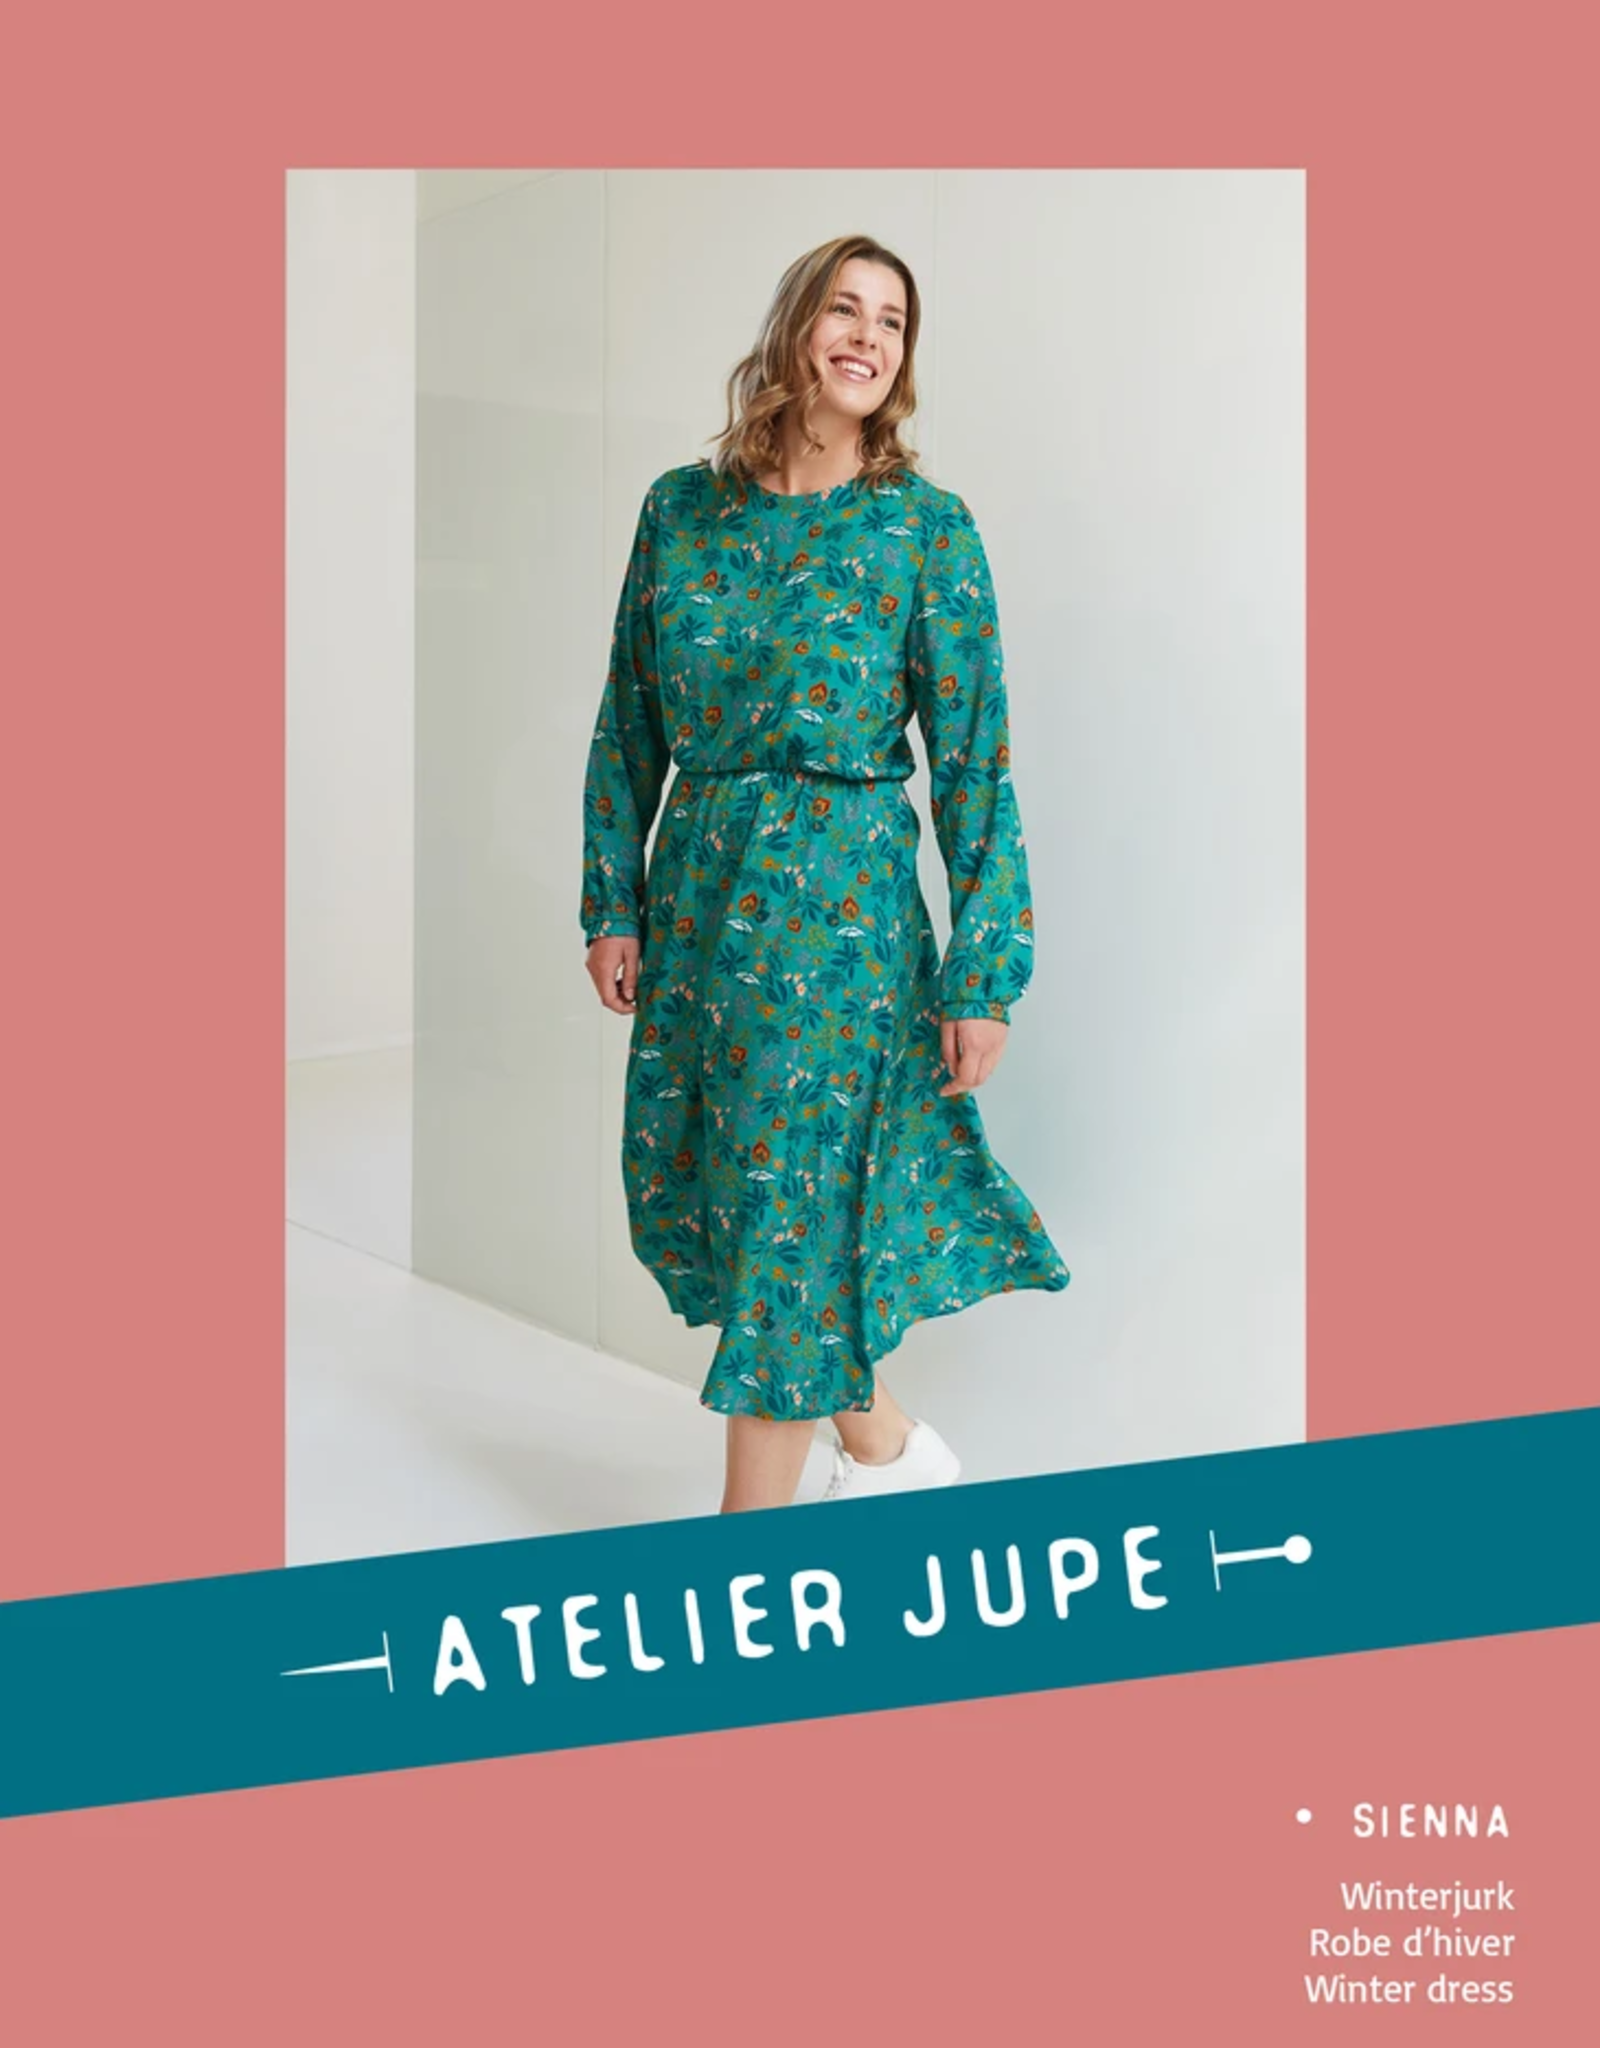 Atelier Jupe Atelier Jupe - Sienna Winterjurk